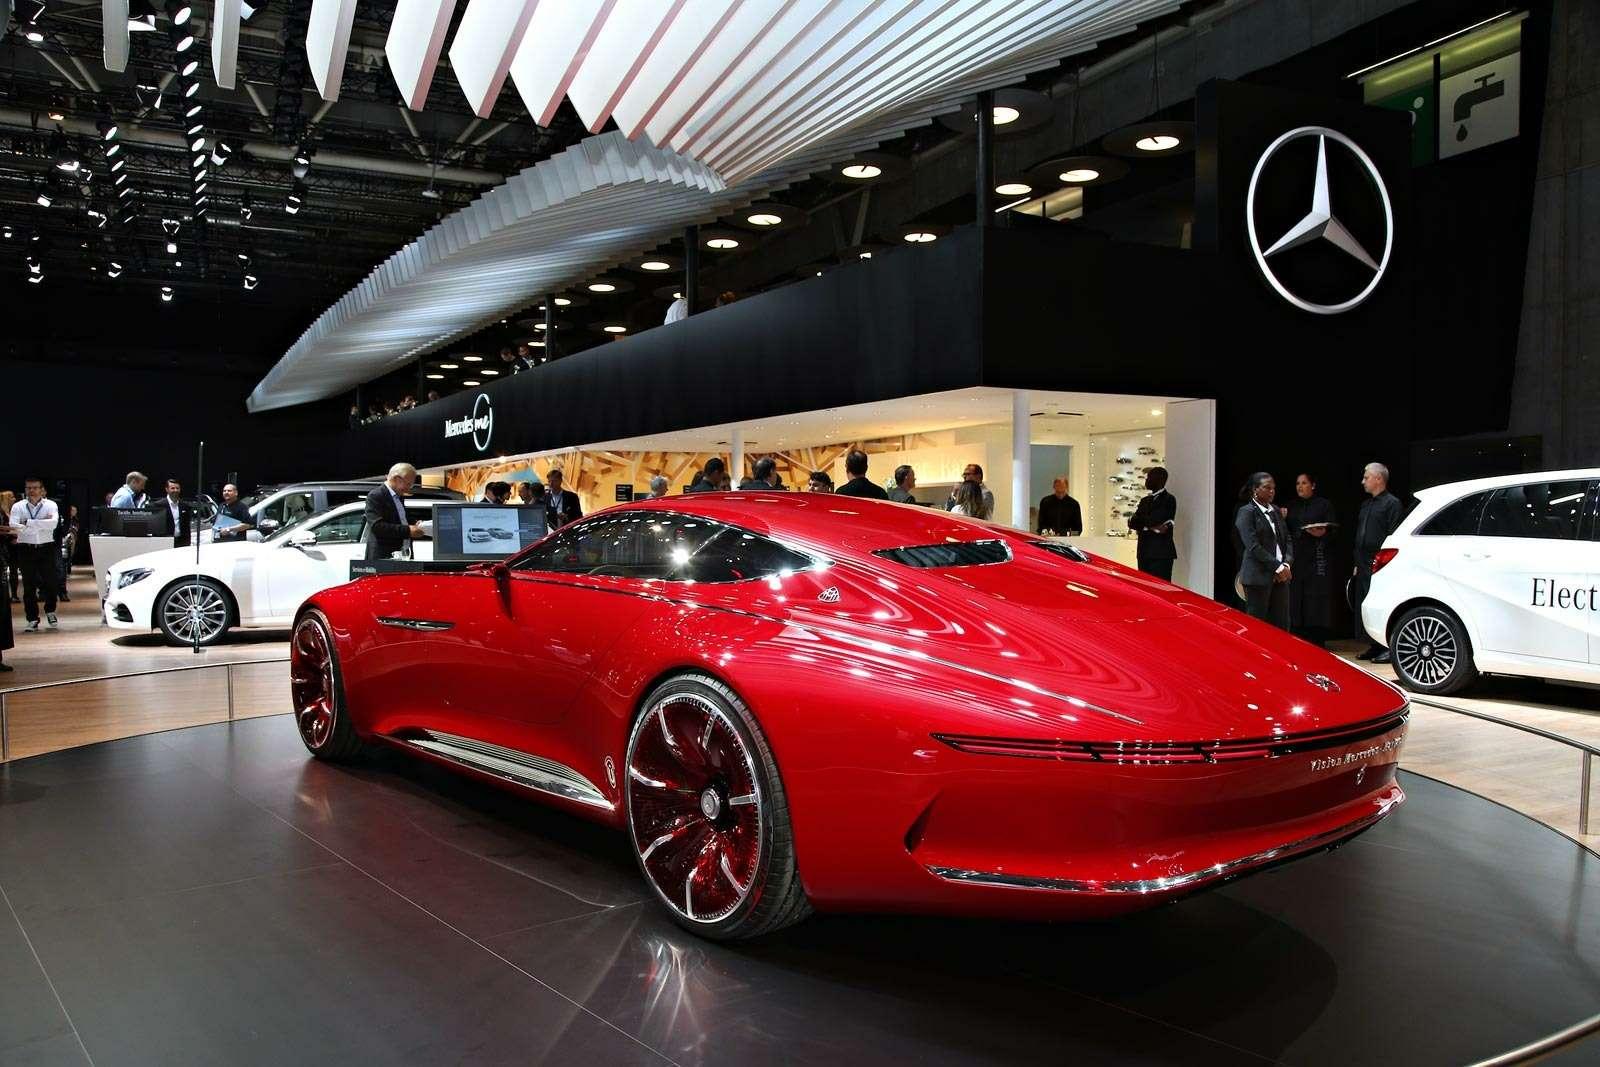 Самый красивый автомобиль Парижа: Vision Mercedes-Maybach 6завоевывает сердца— фото 643570